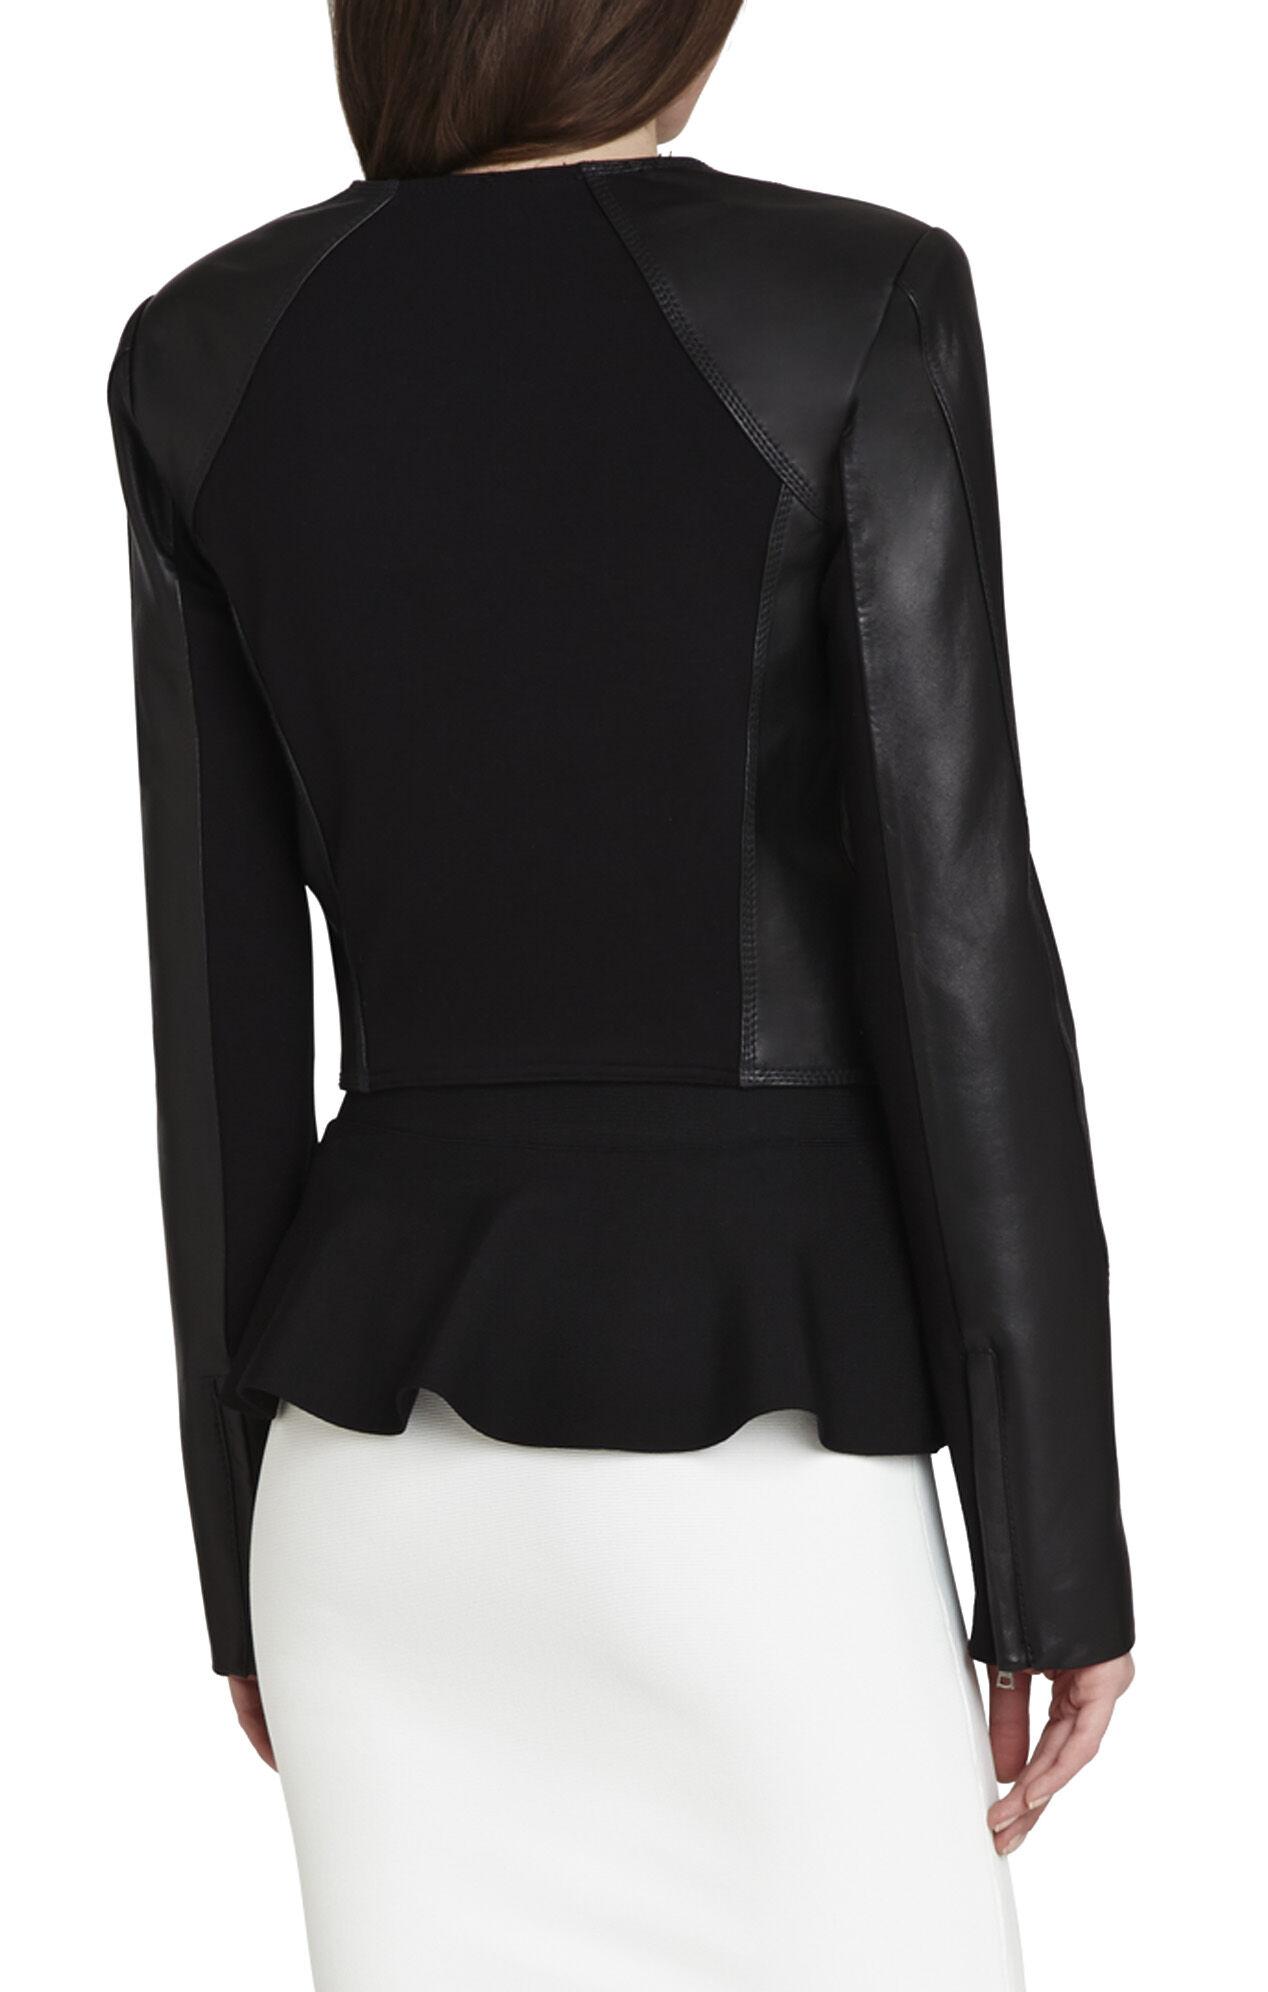 Jacob Leather Jacket